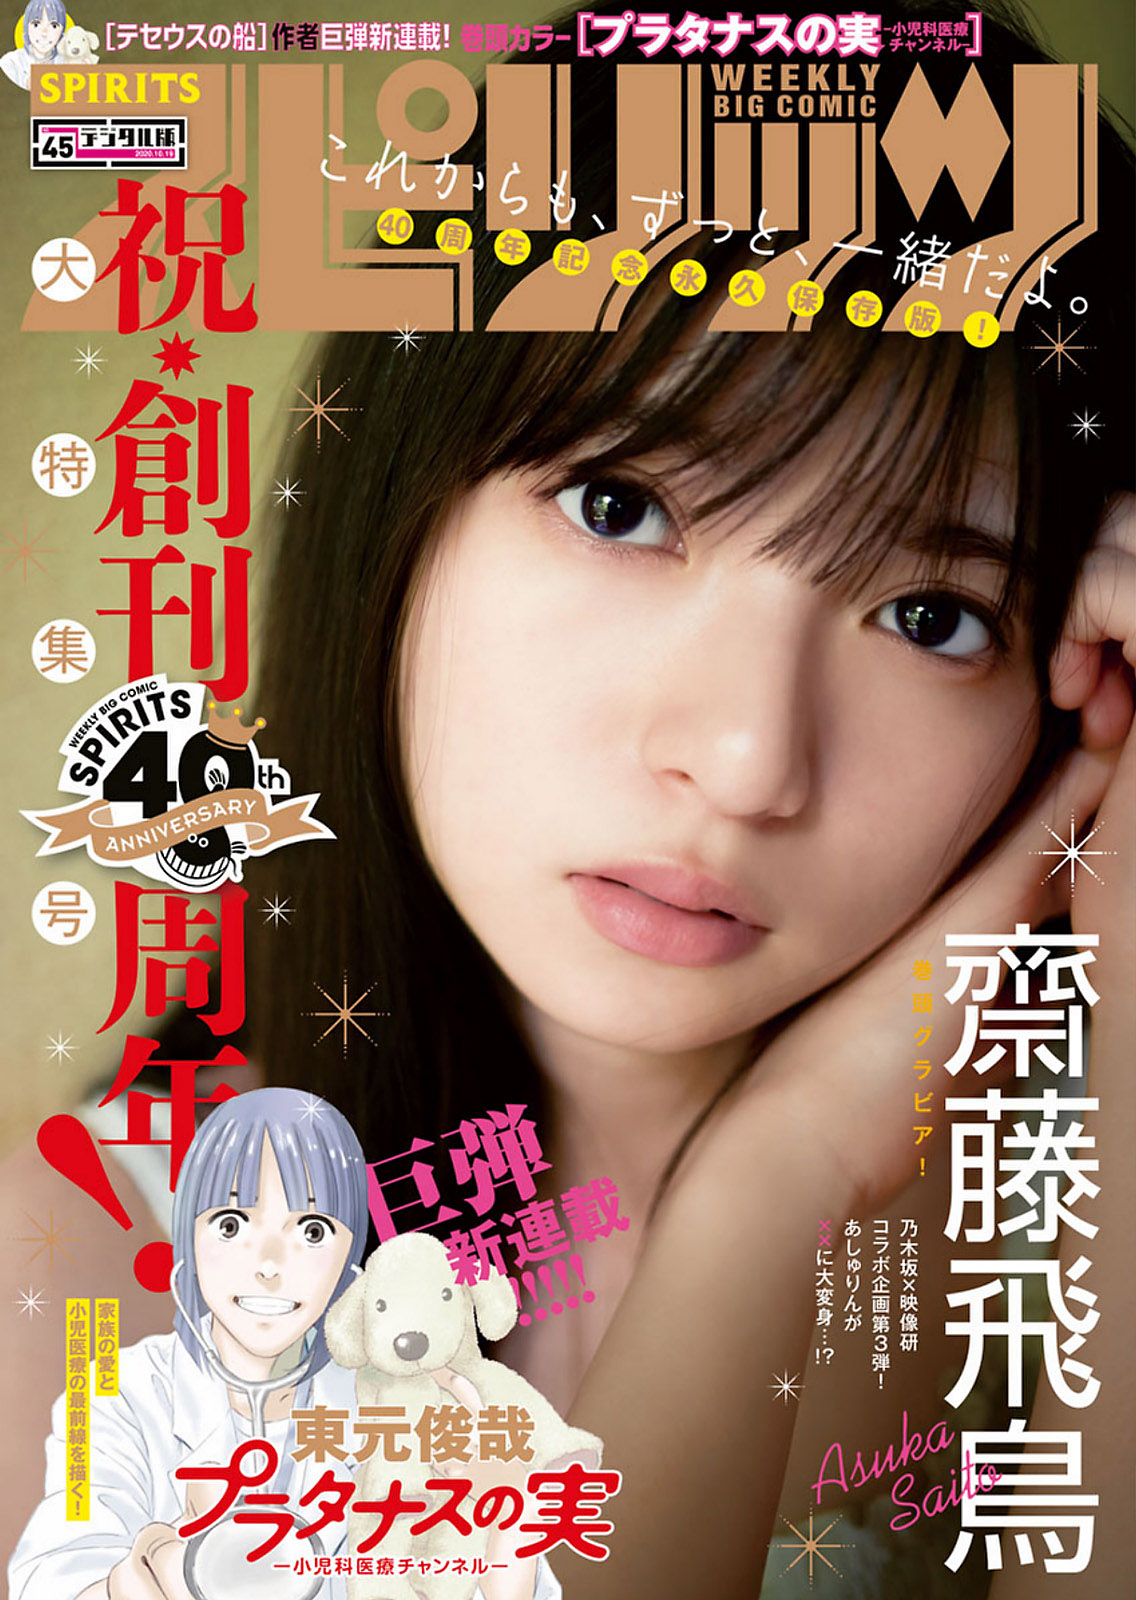 SAsuka Big Comic Spirits 201015 01.jpg